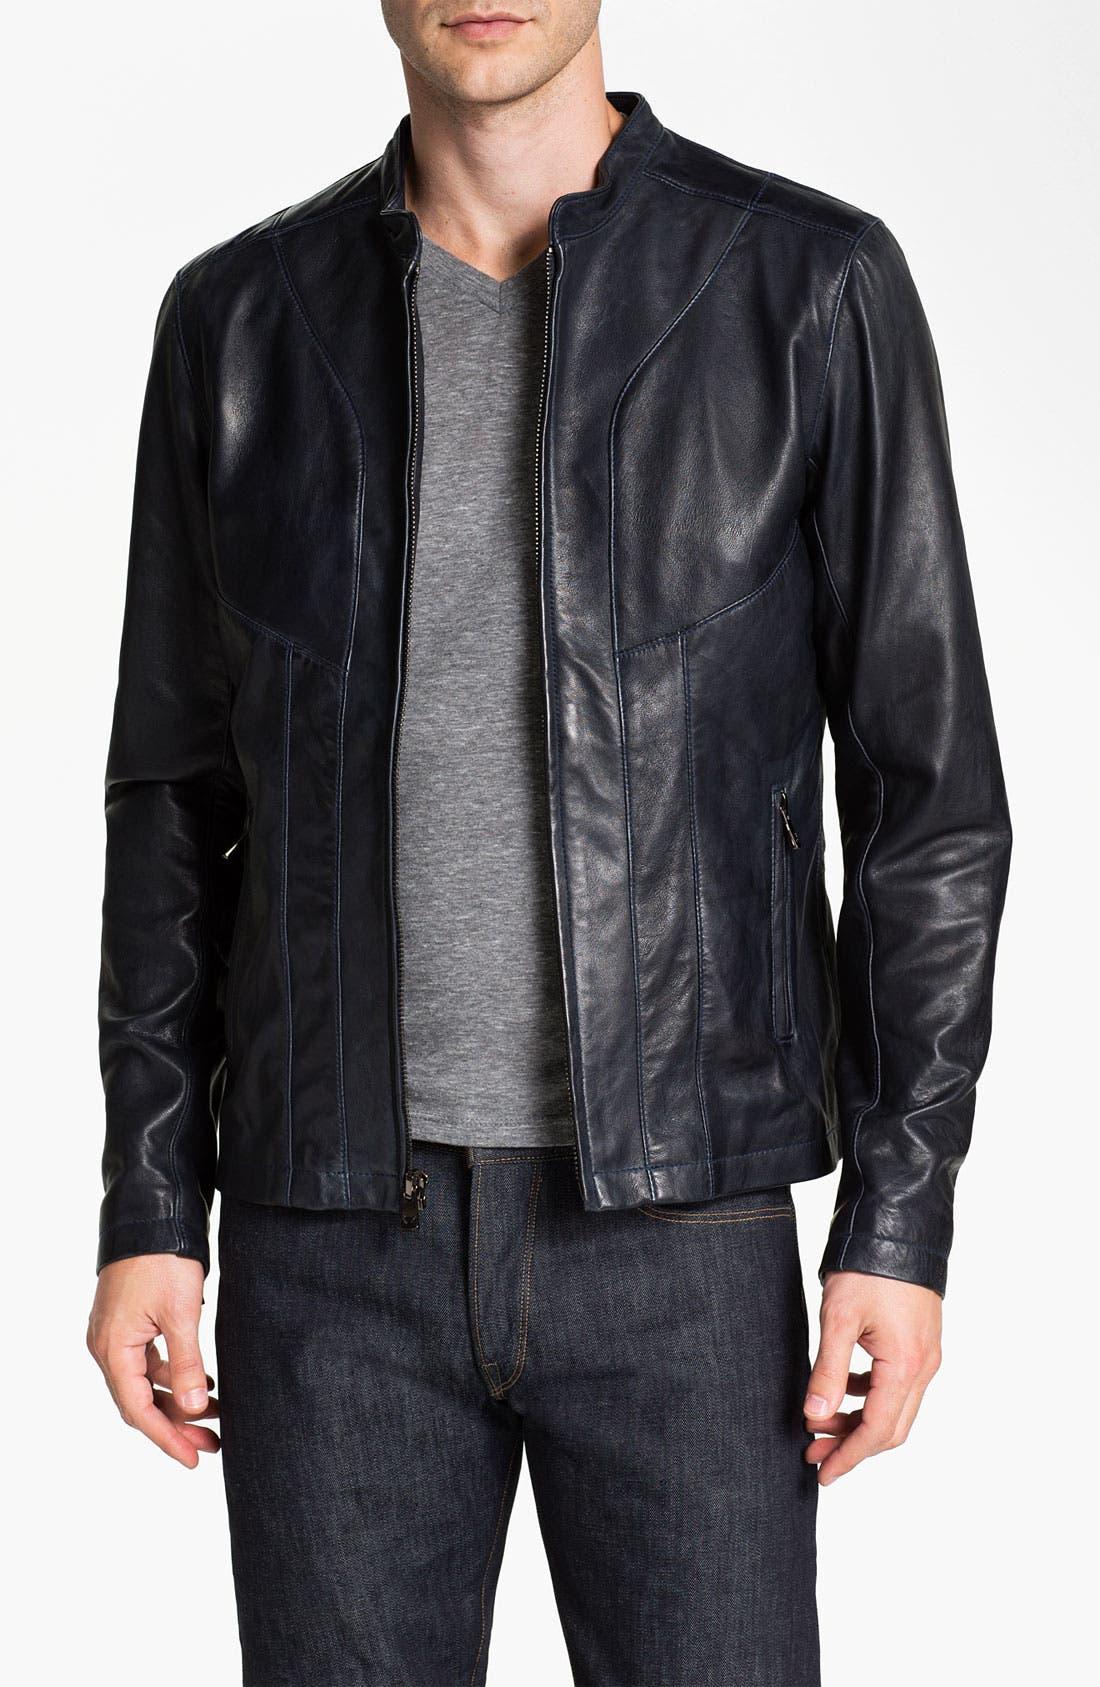 Main Image - Bod & Christensen Leather Moto Jacket